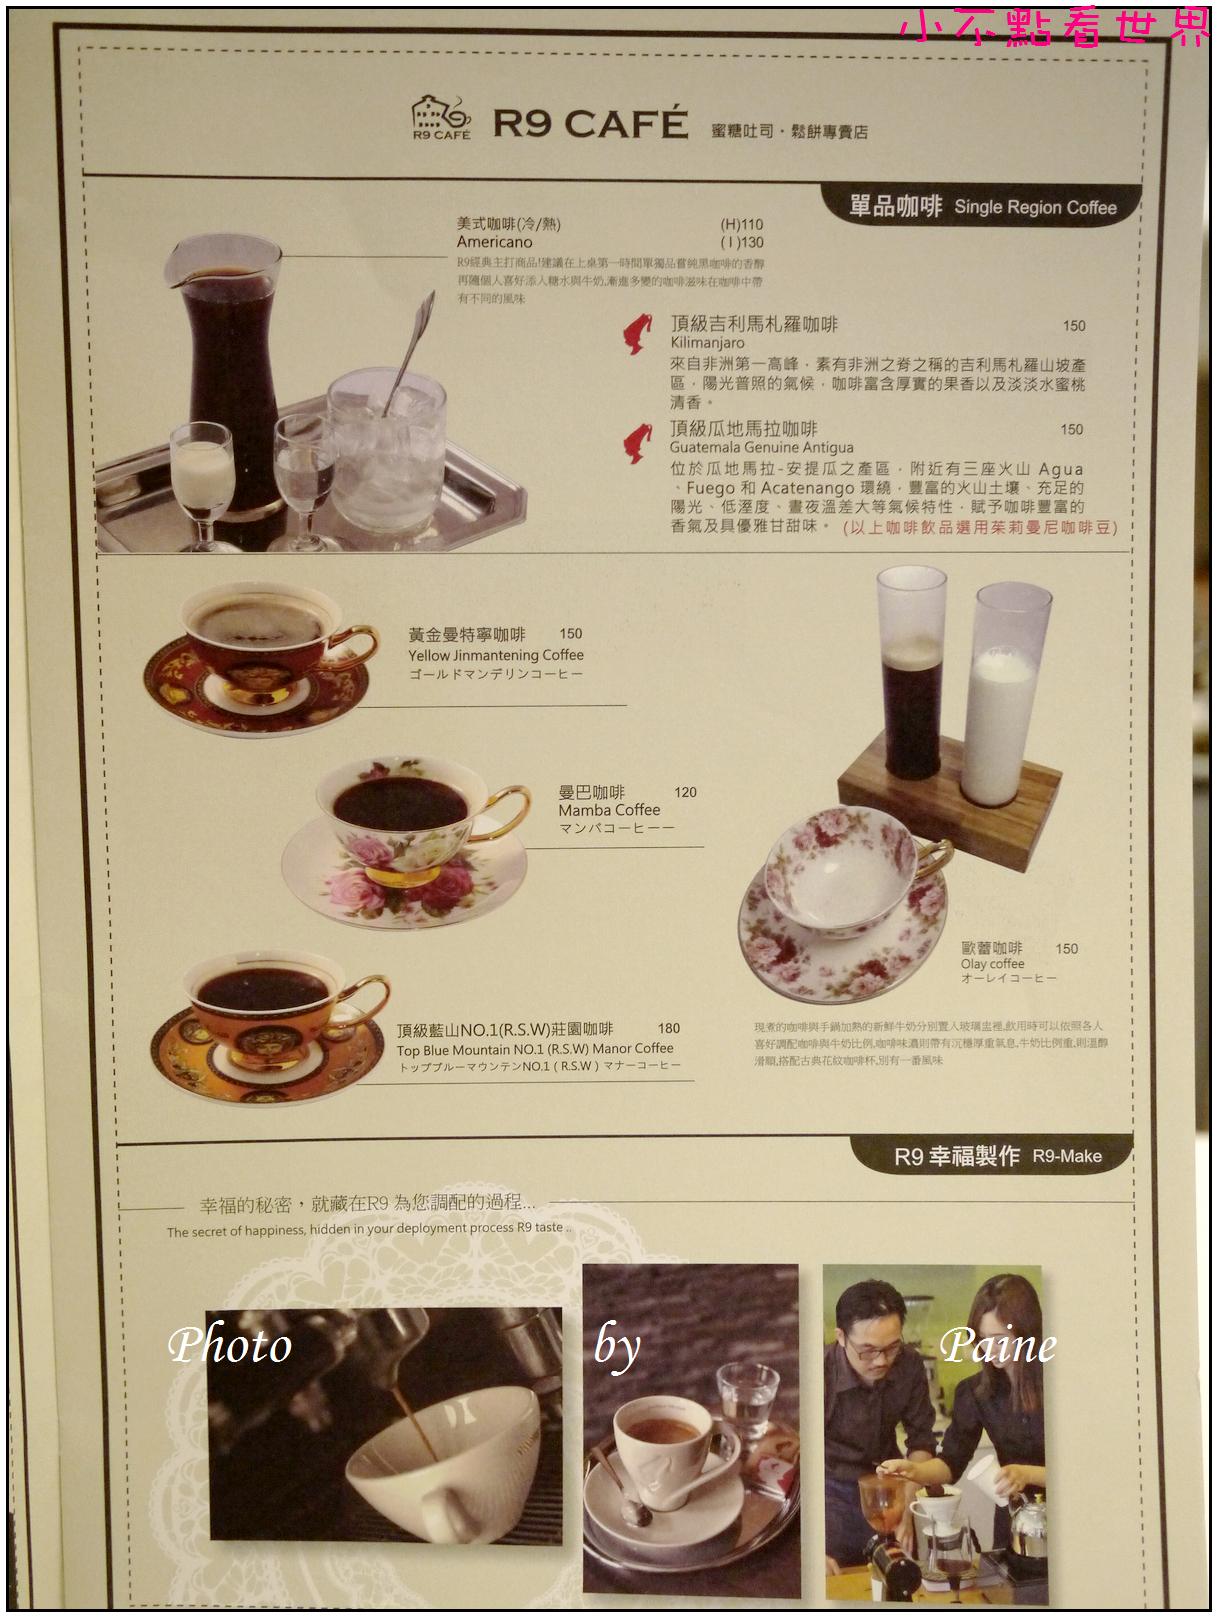 桃園R9 CAFE (14).JPG